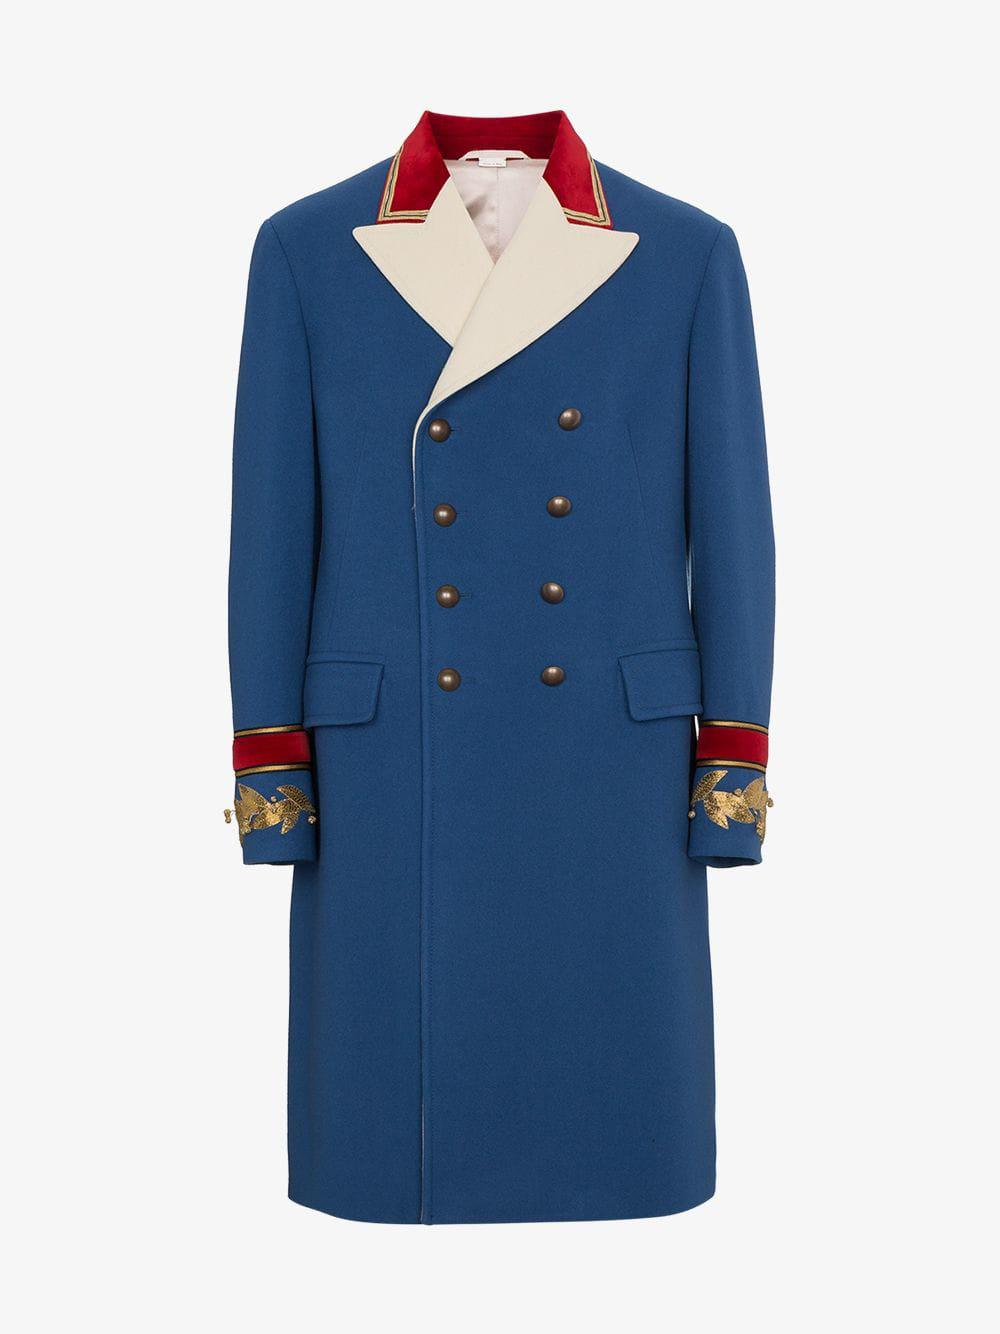 8edbbf11f61c Gucci - Blue Wool Cashmere Coat for Men - Lyst. View fullscreen